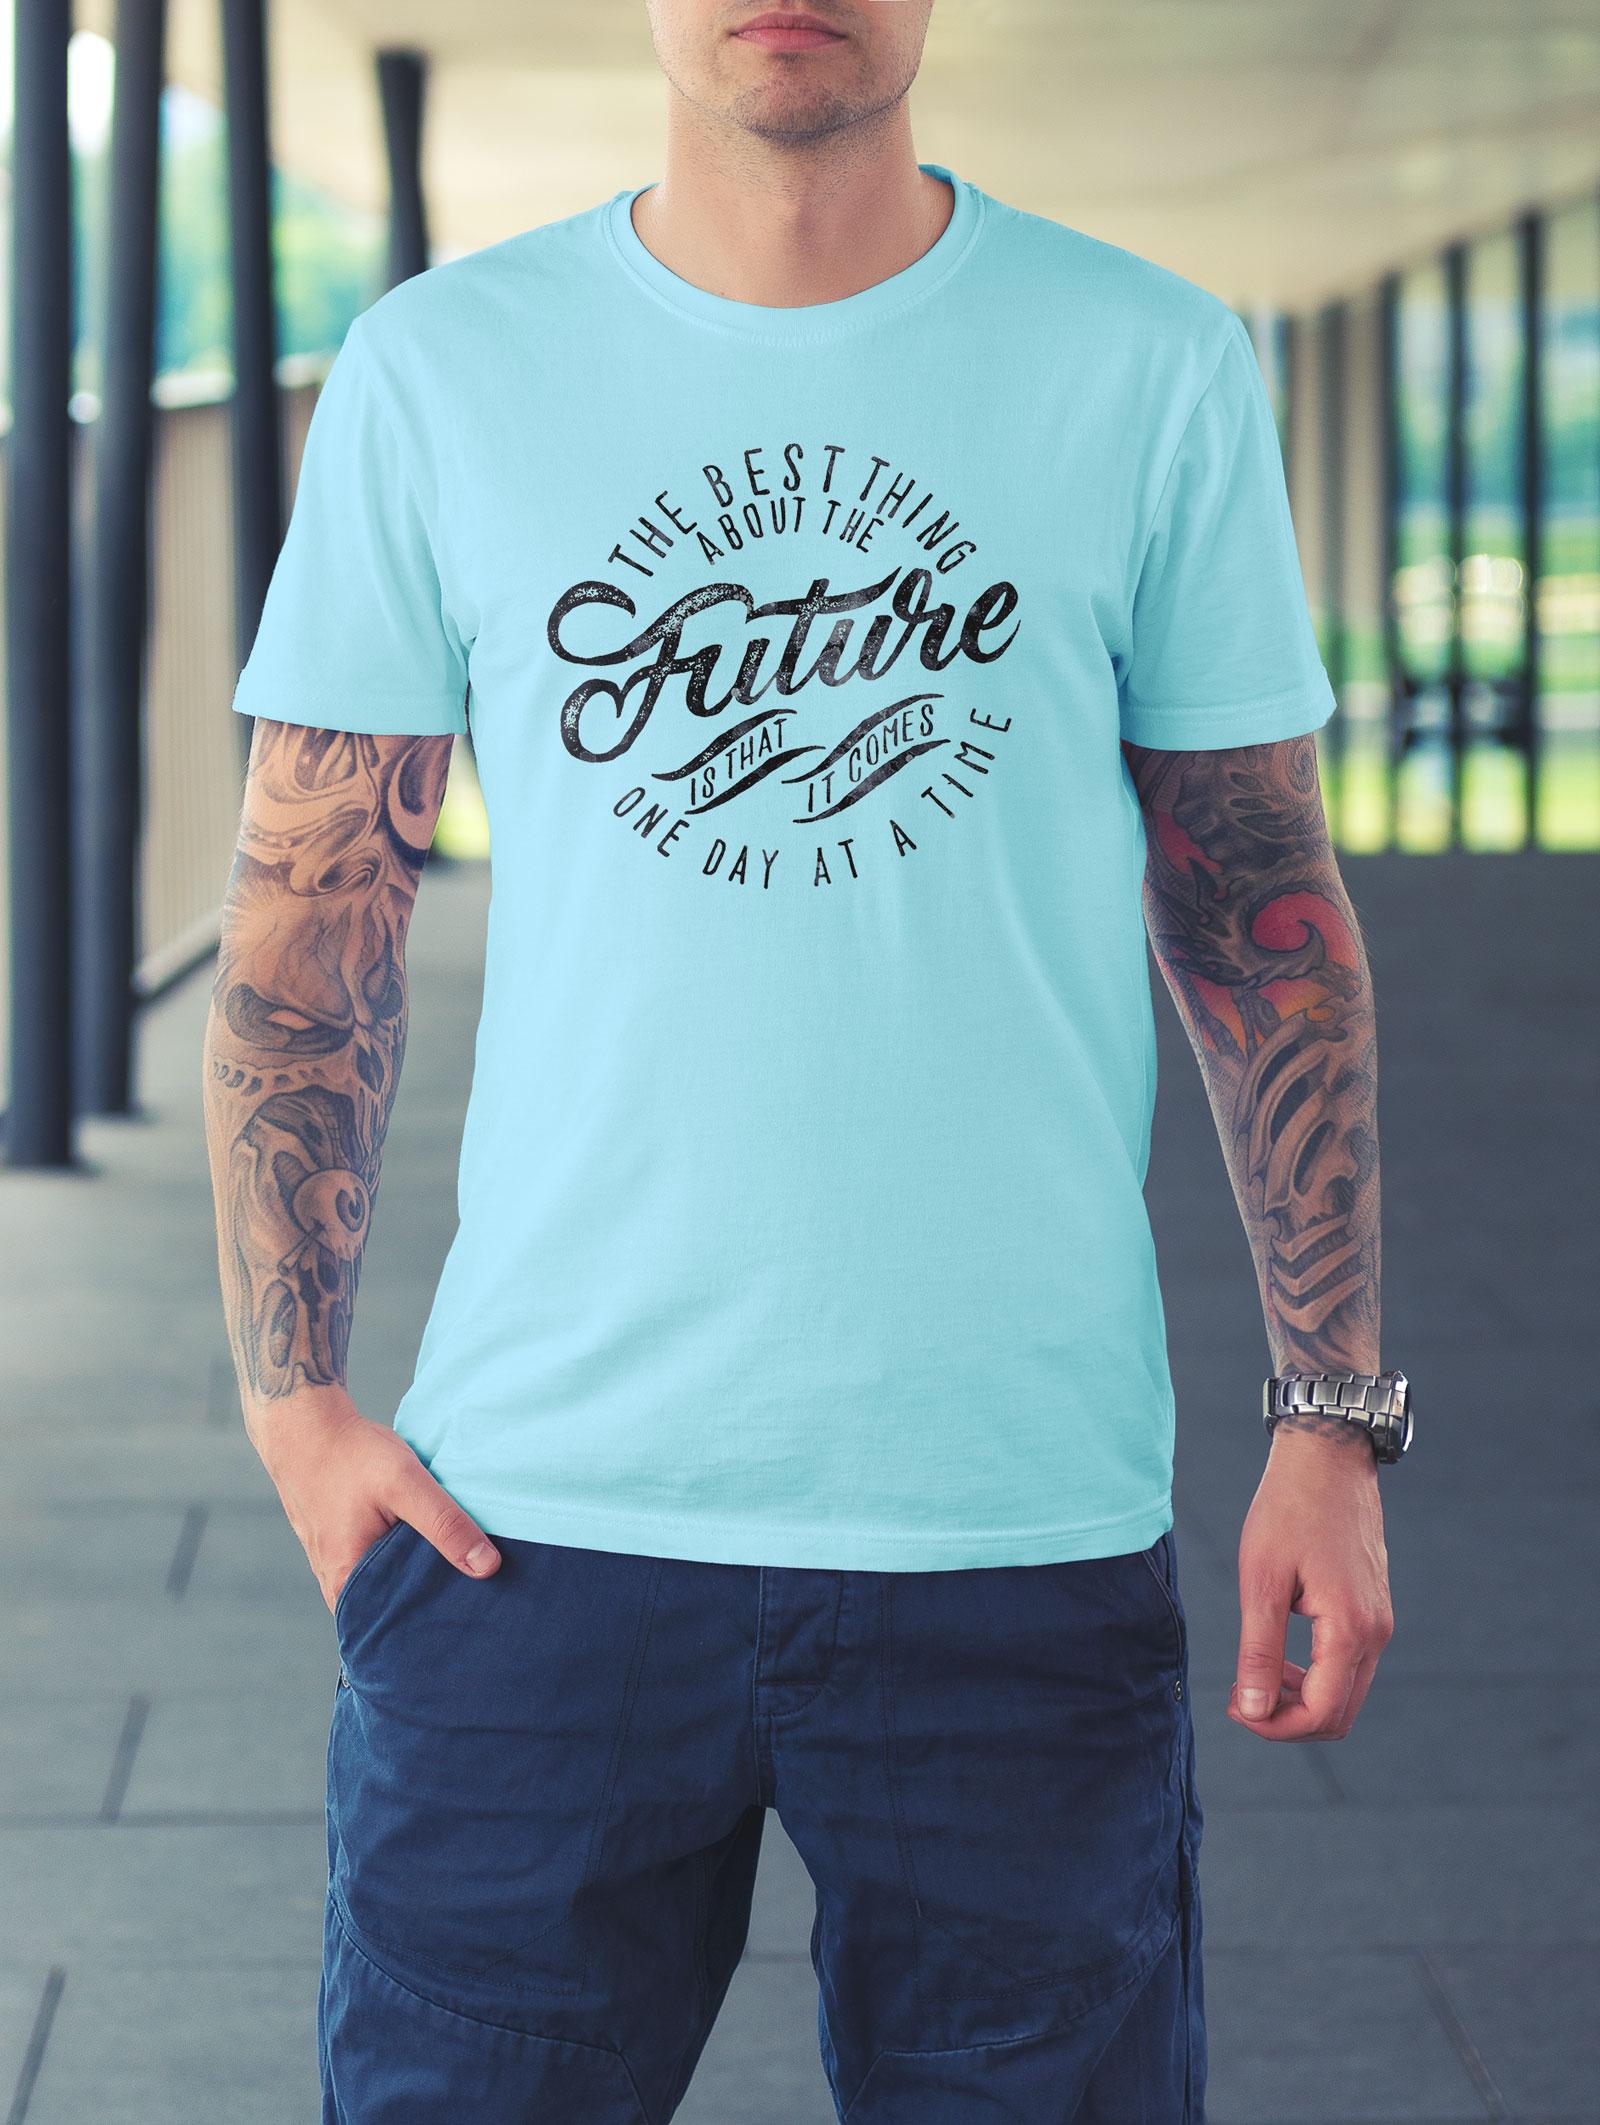 Free-Male-T-Shirt-Mockup-PSD